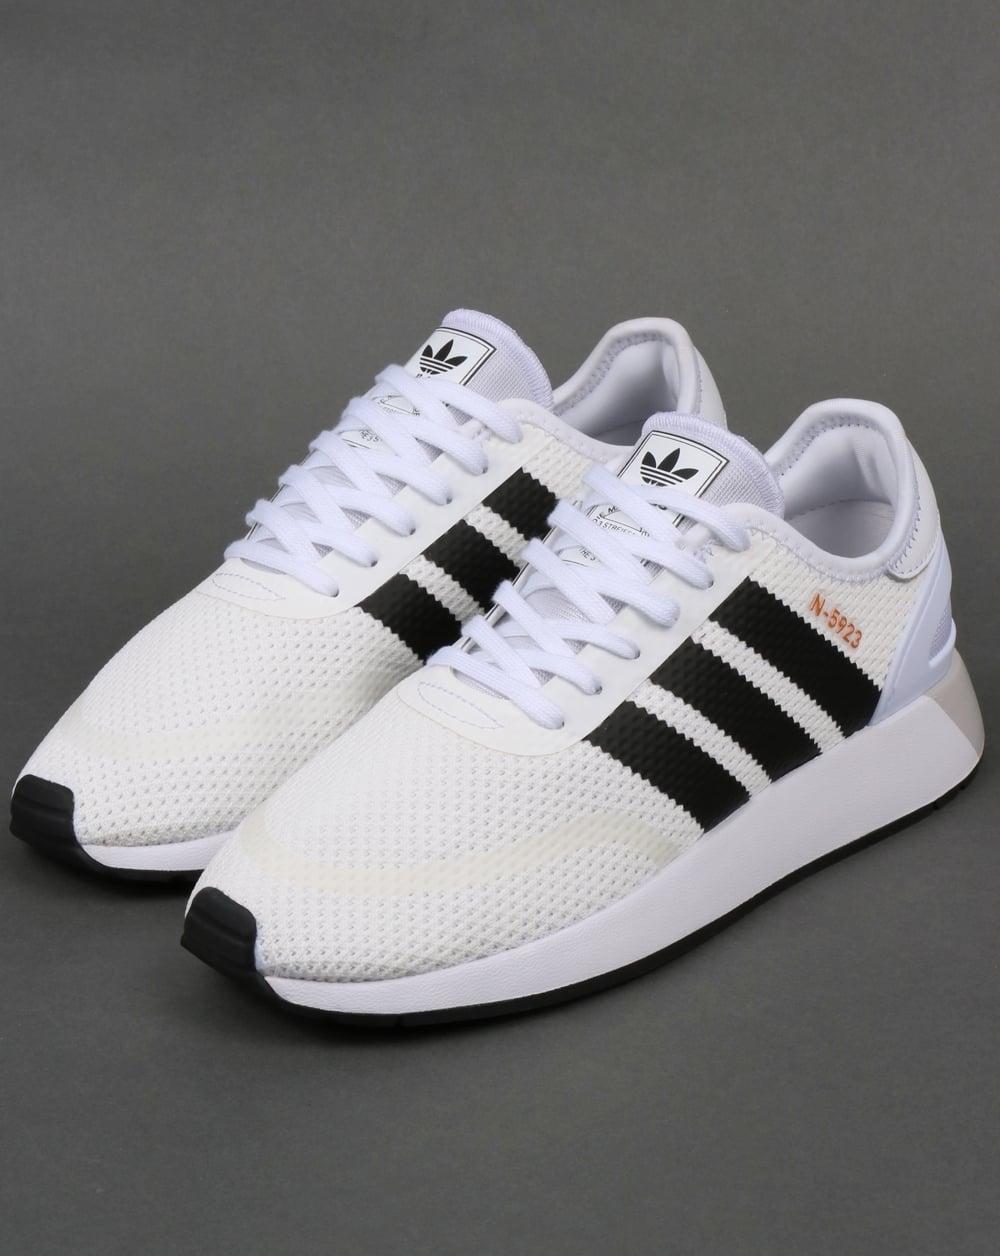 New Iniki Shoes